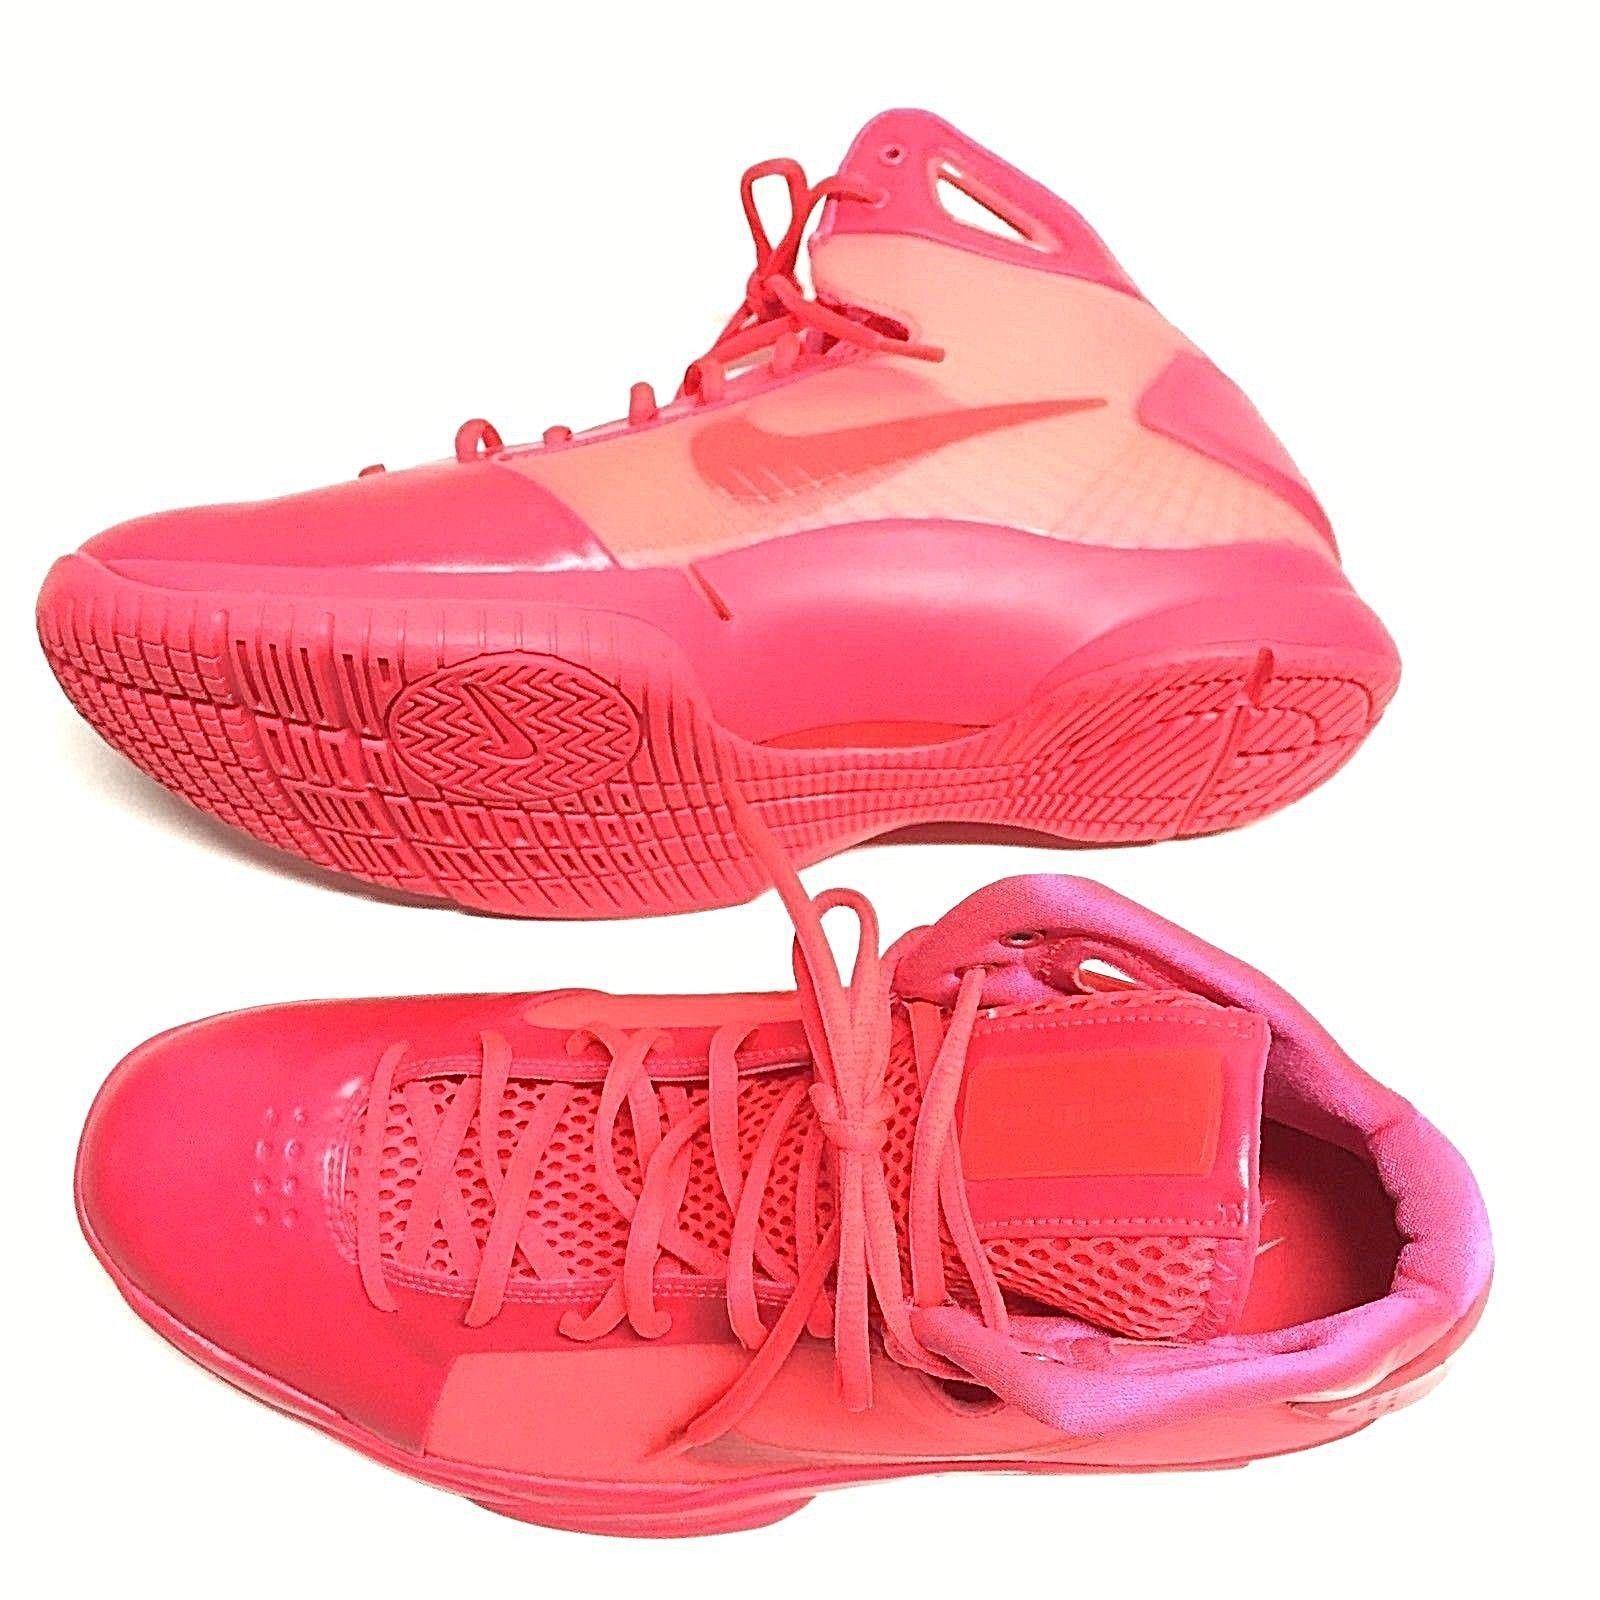 Nike uomini amatori hyperdunk 08 amatori uomini basket 2016 sz 13 solare 820321-600 rosso 1014d1